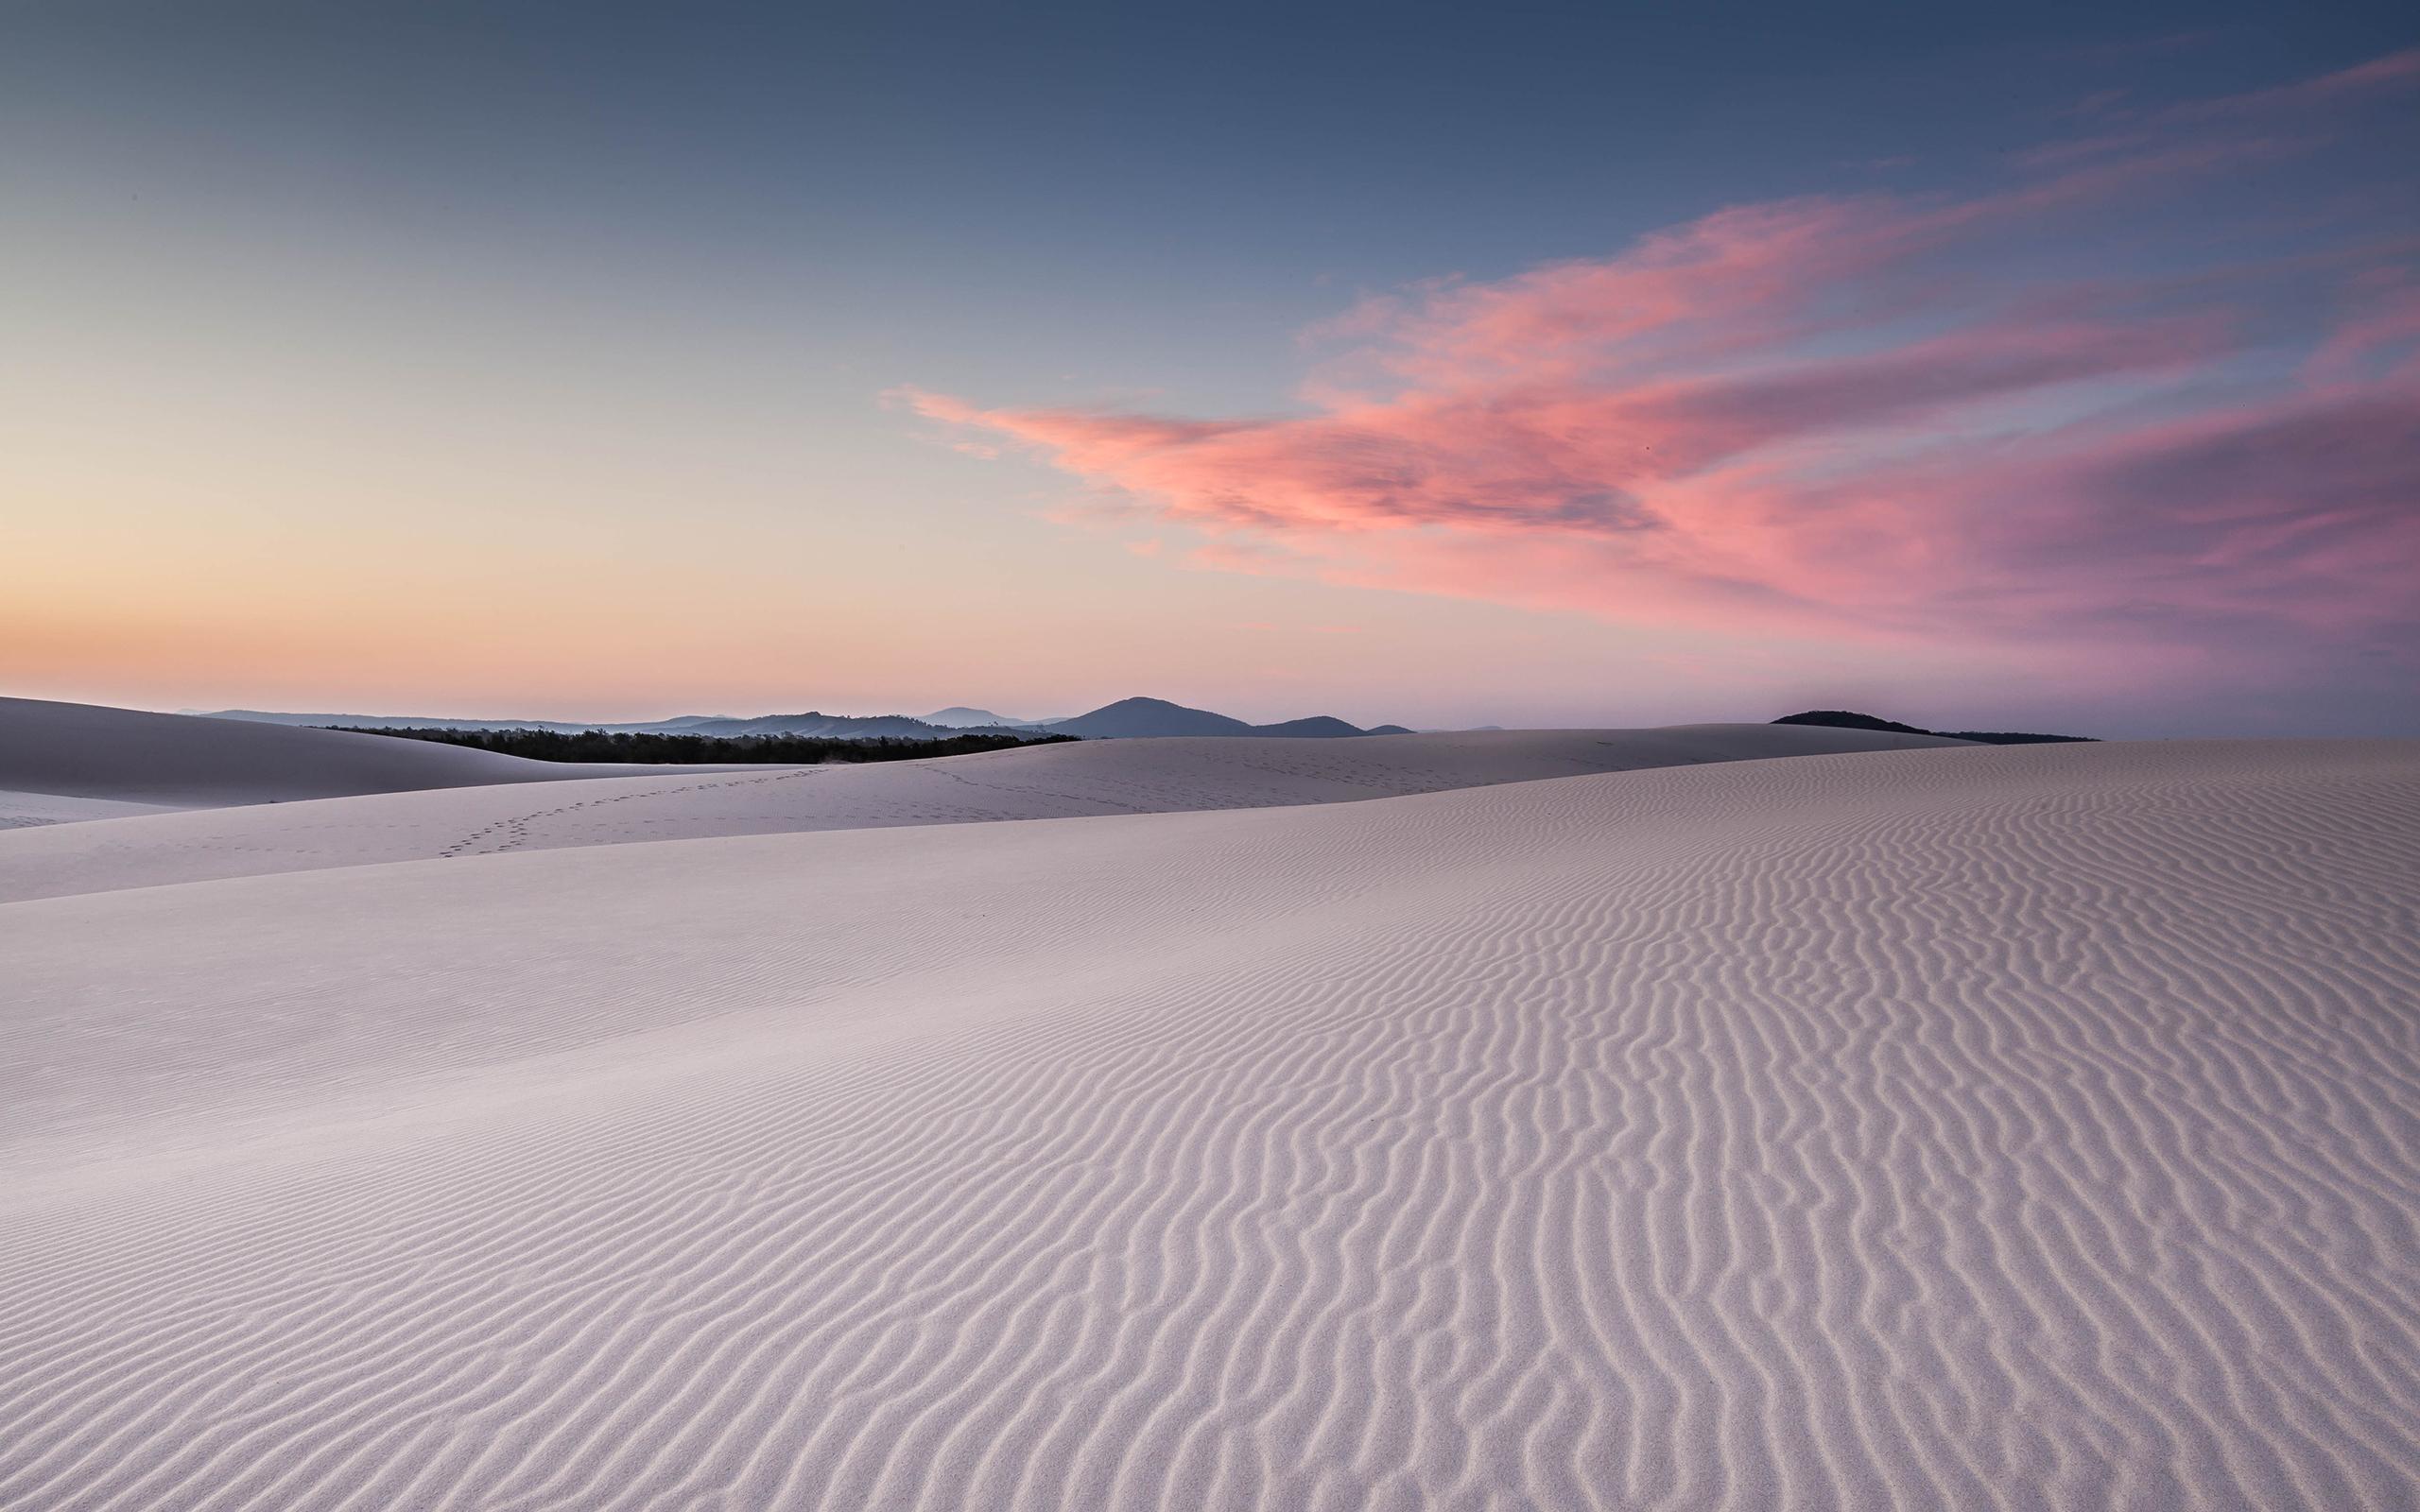 Ooty Hd Wallpapers Desert Hd Wallpaper Background Image 2560x1600 Id